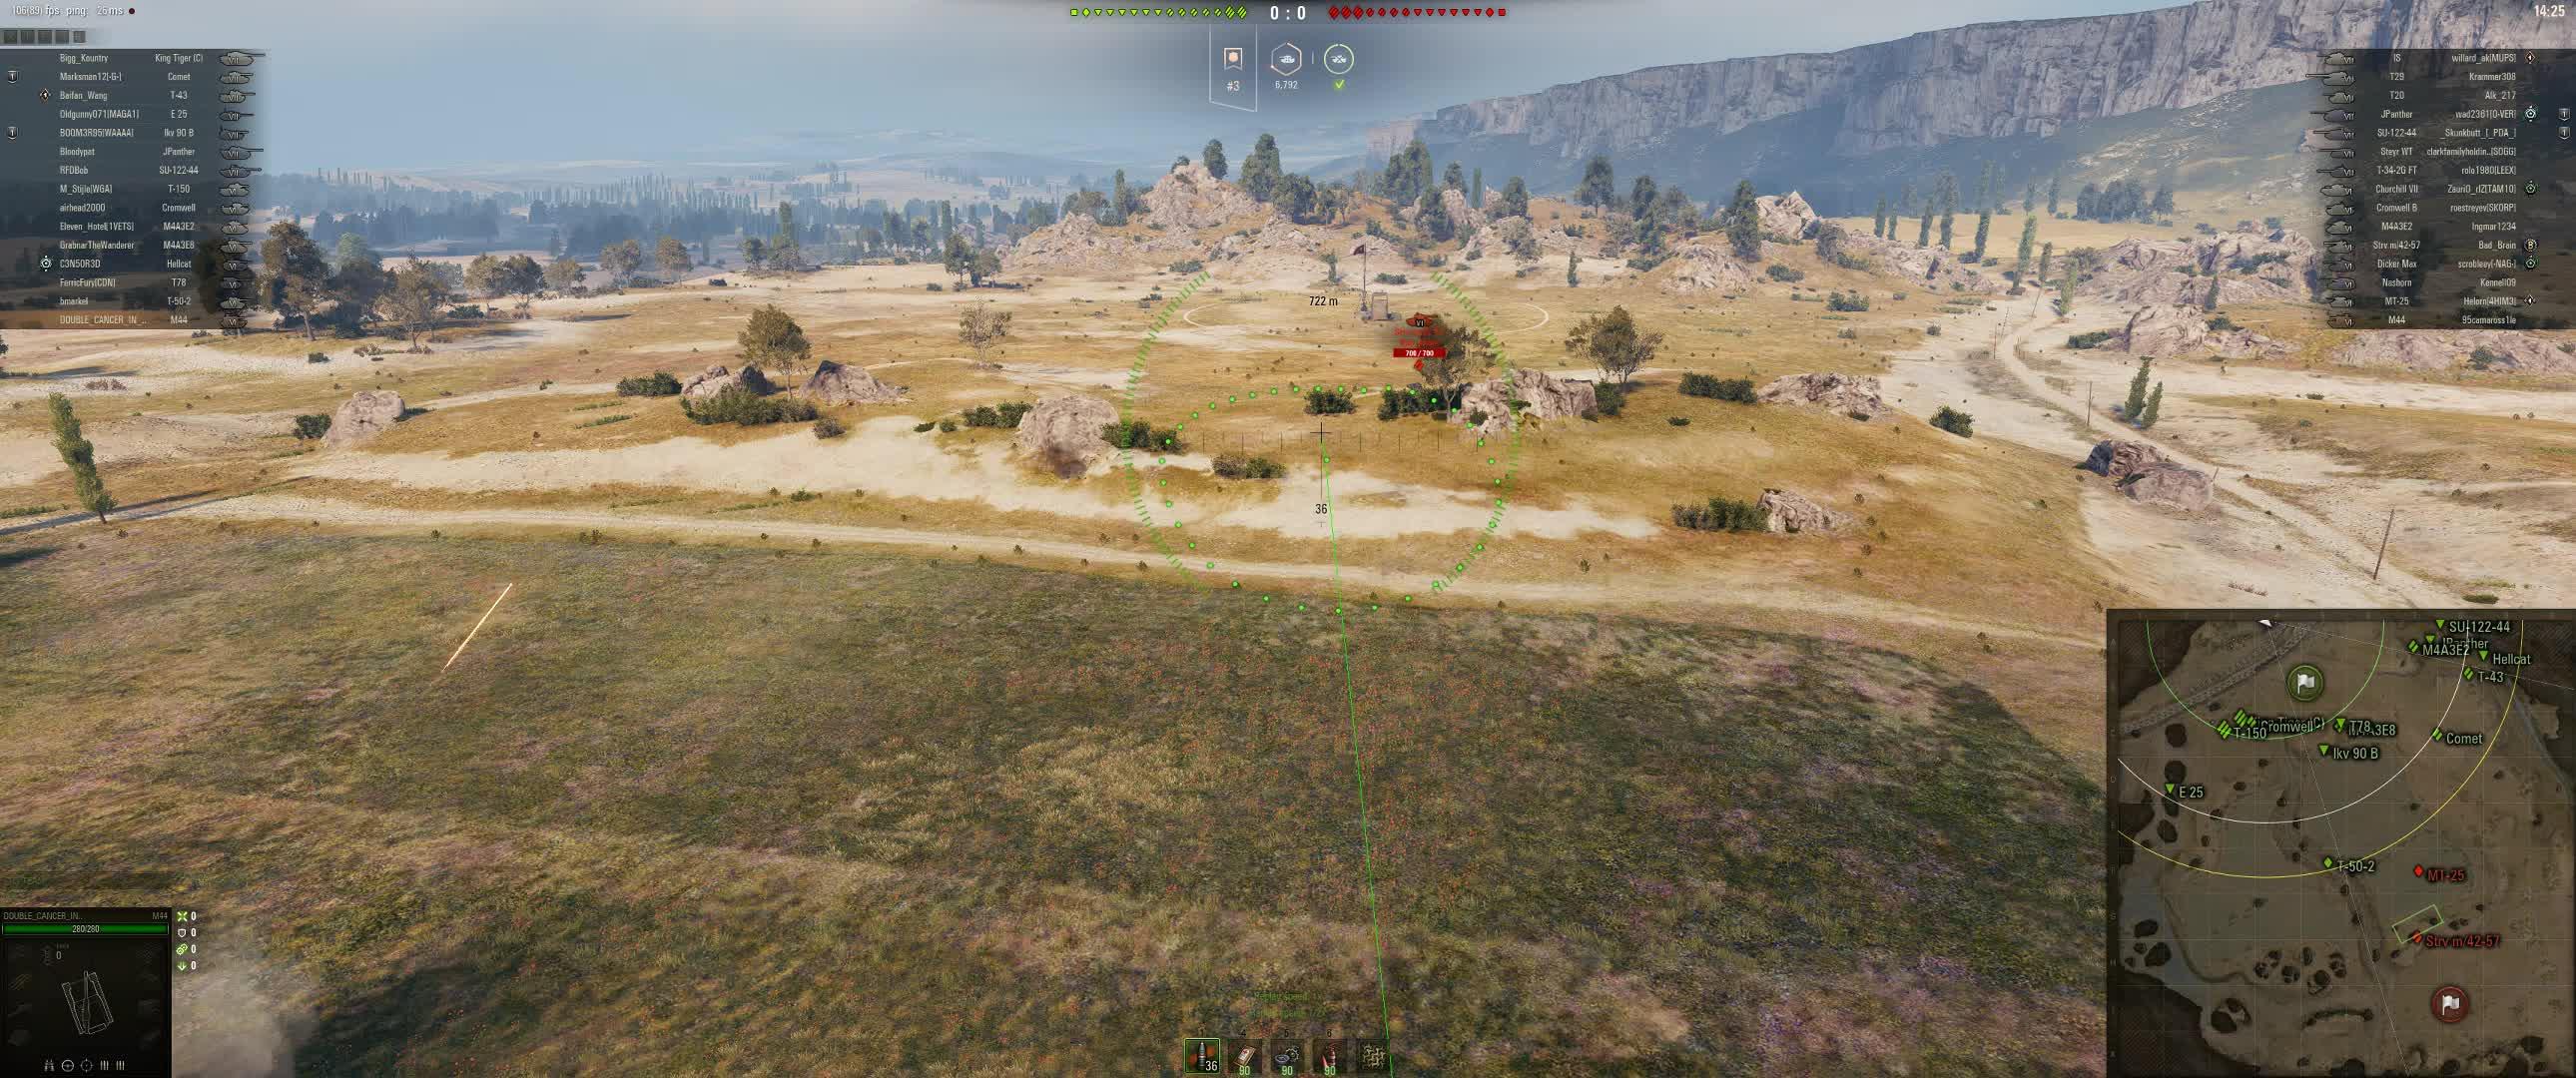 artillery, skycancer, world of tanks, fair and balanced mechanic da komred GIFs